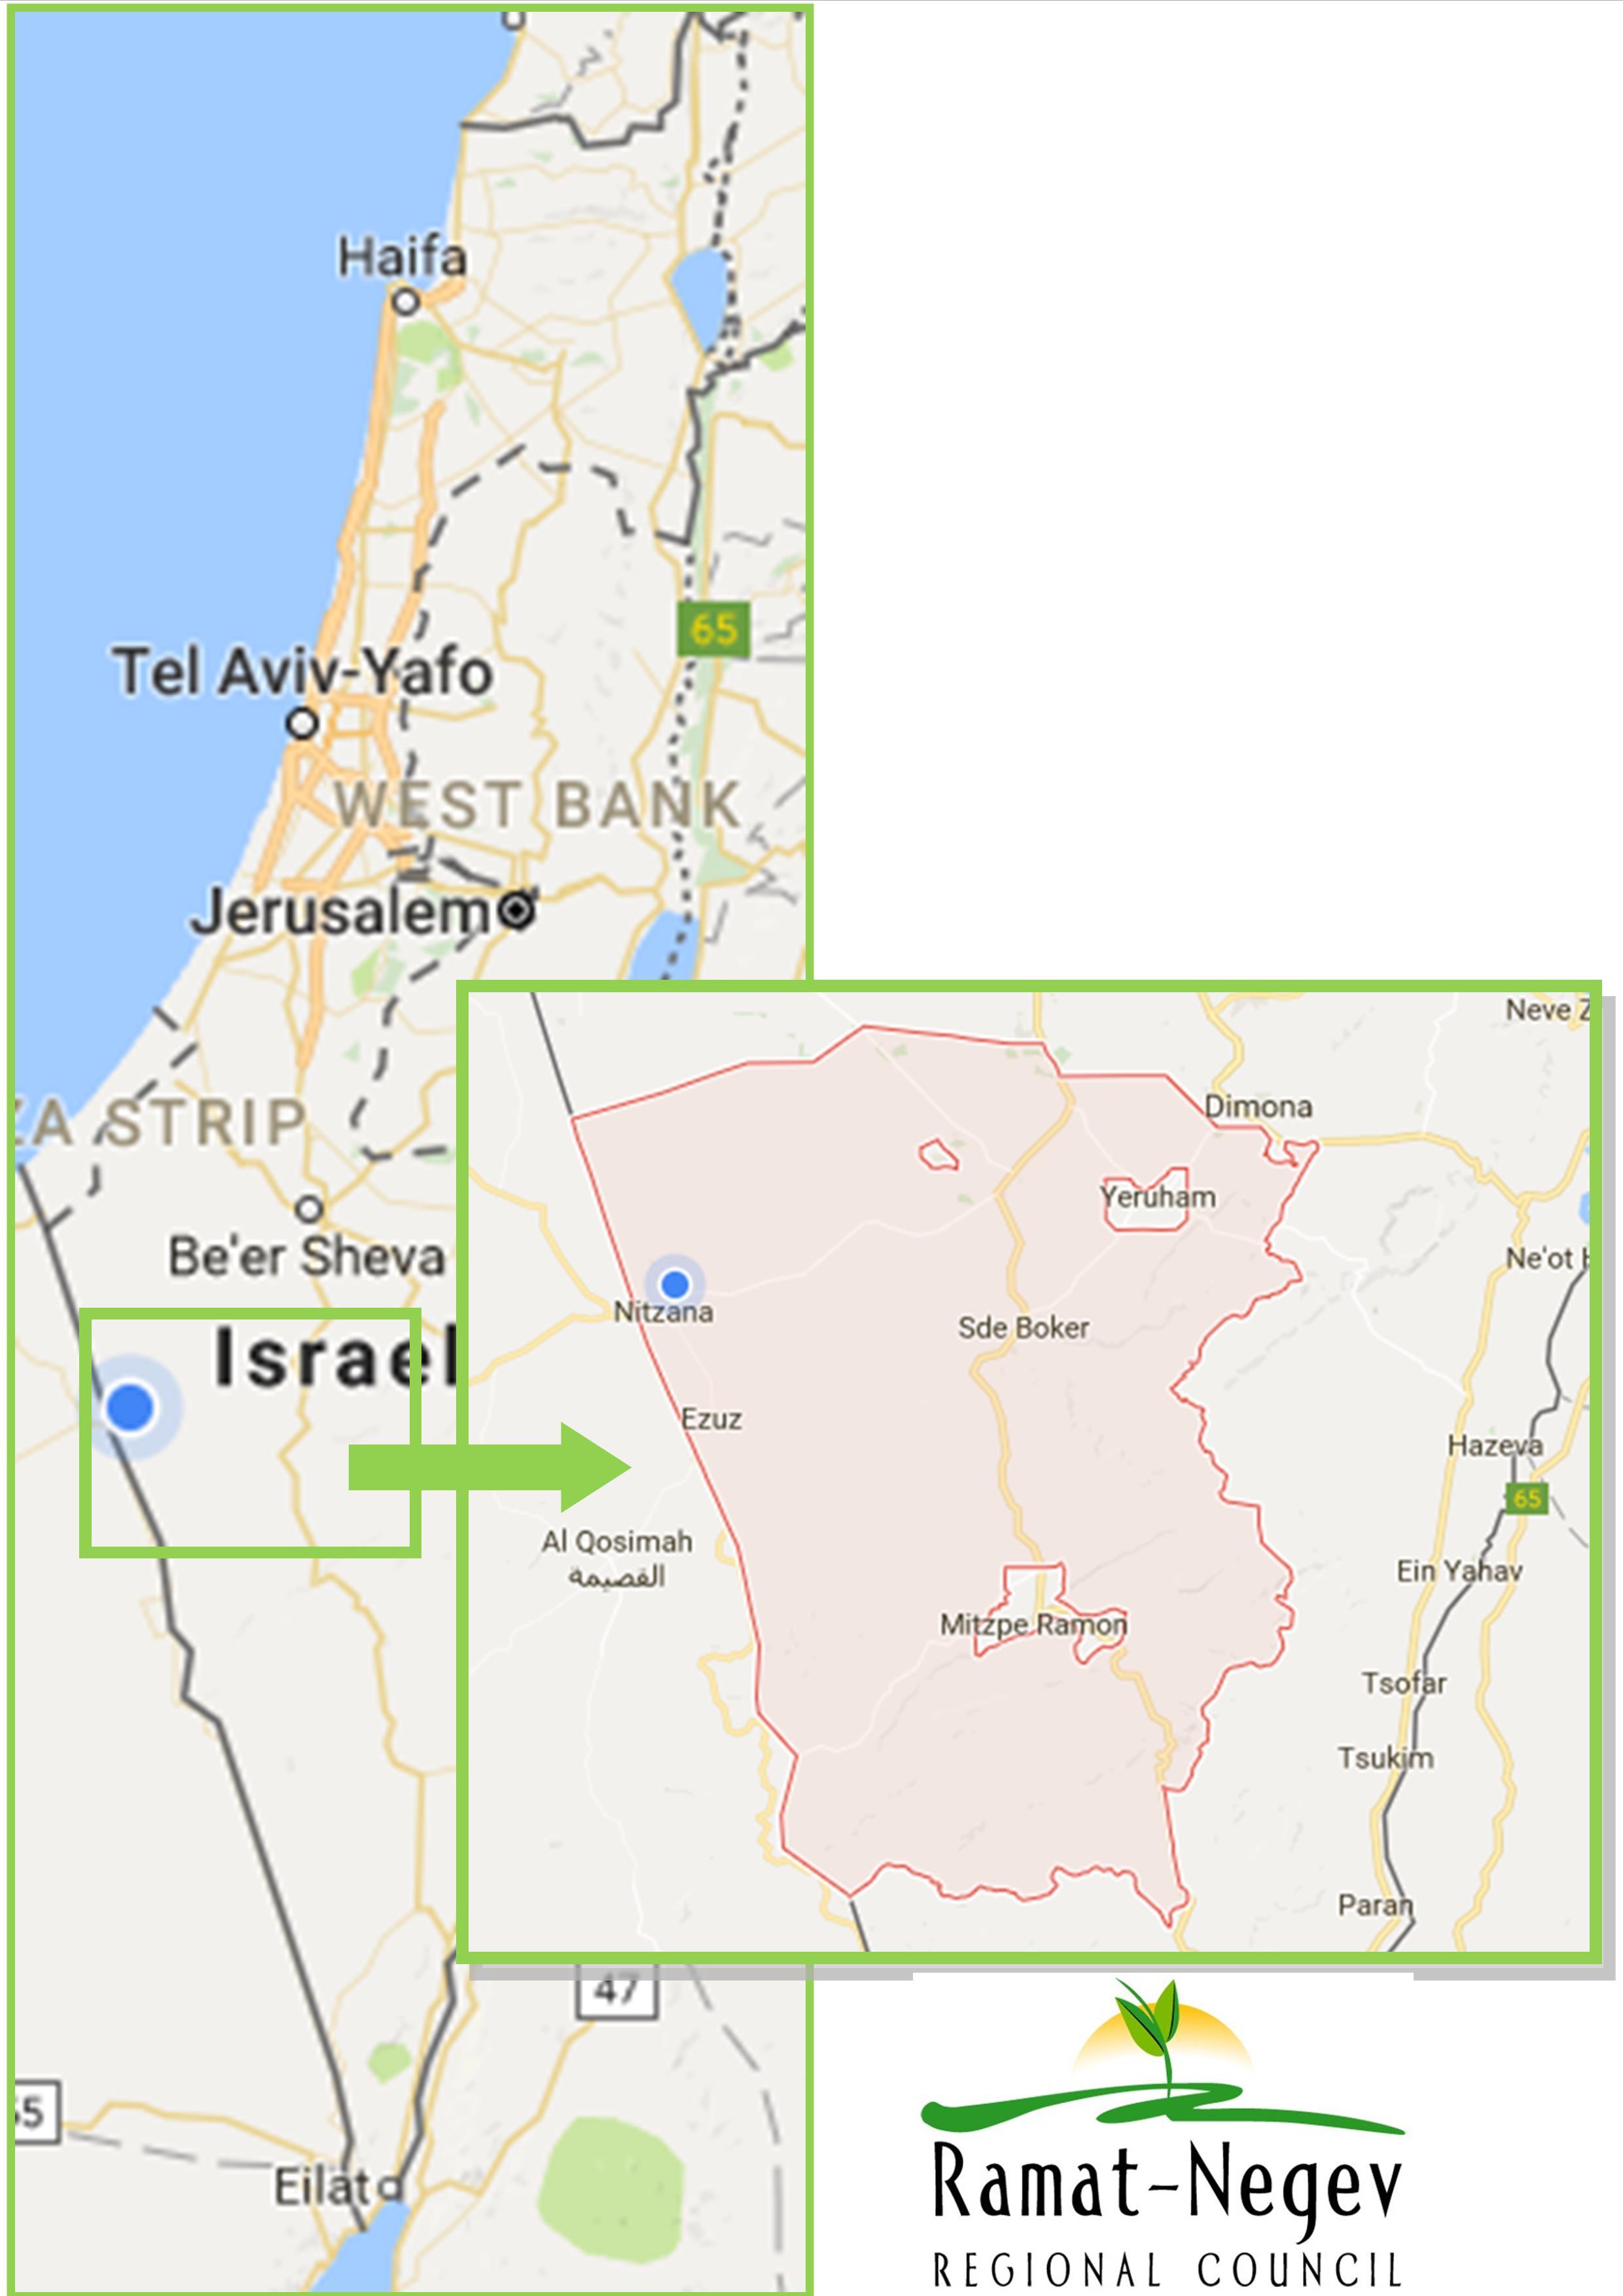 Our Area-Ramat Negev